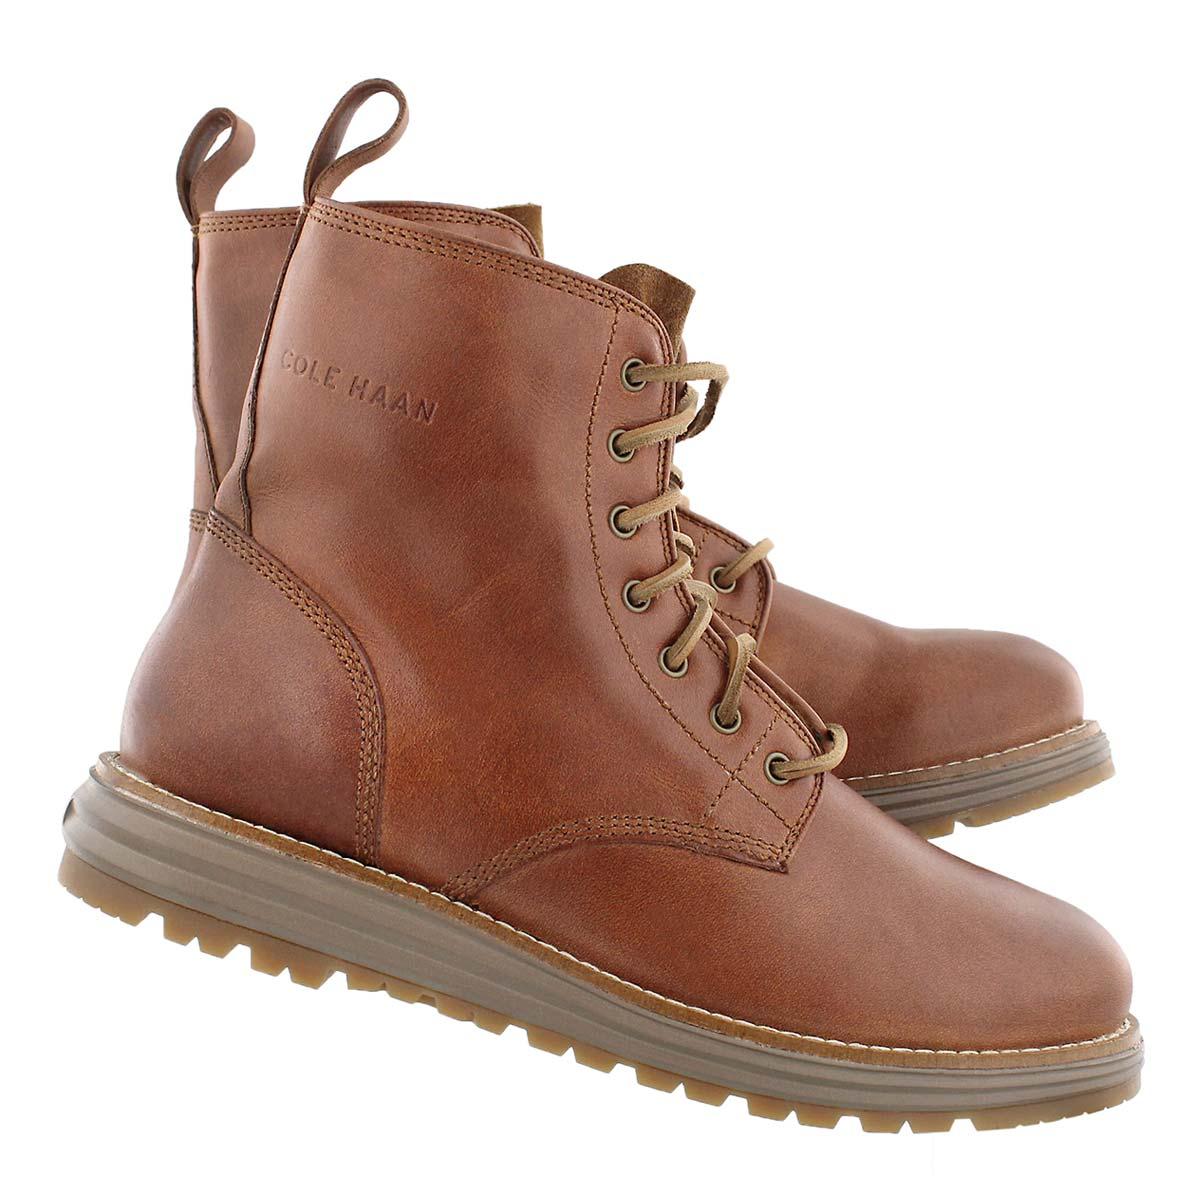 Lds Lockridge Grand woodbury wtpf boot